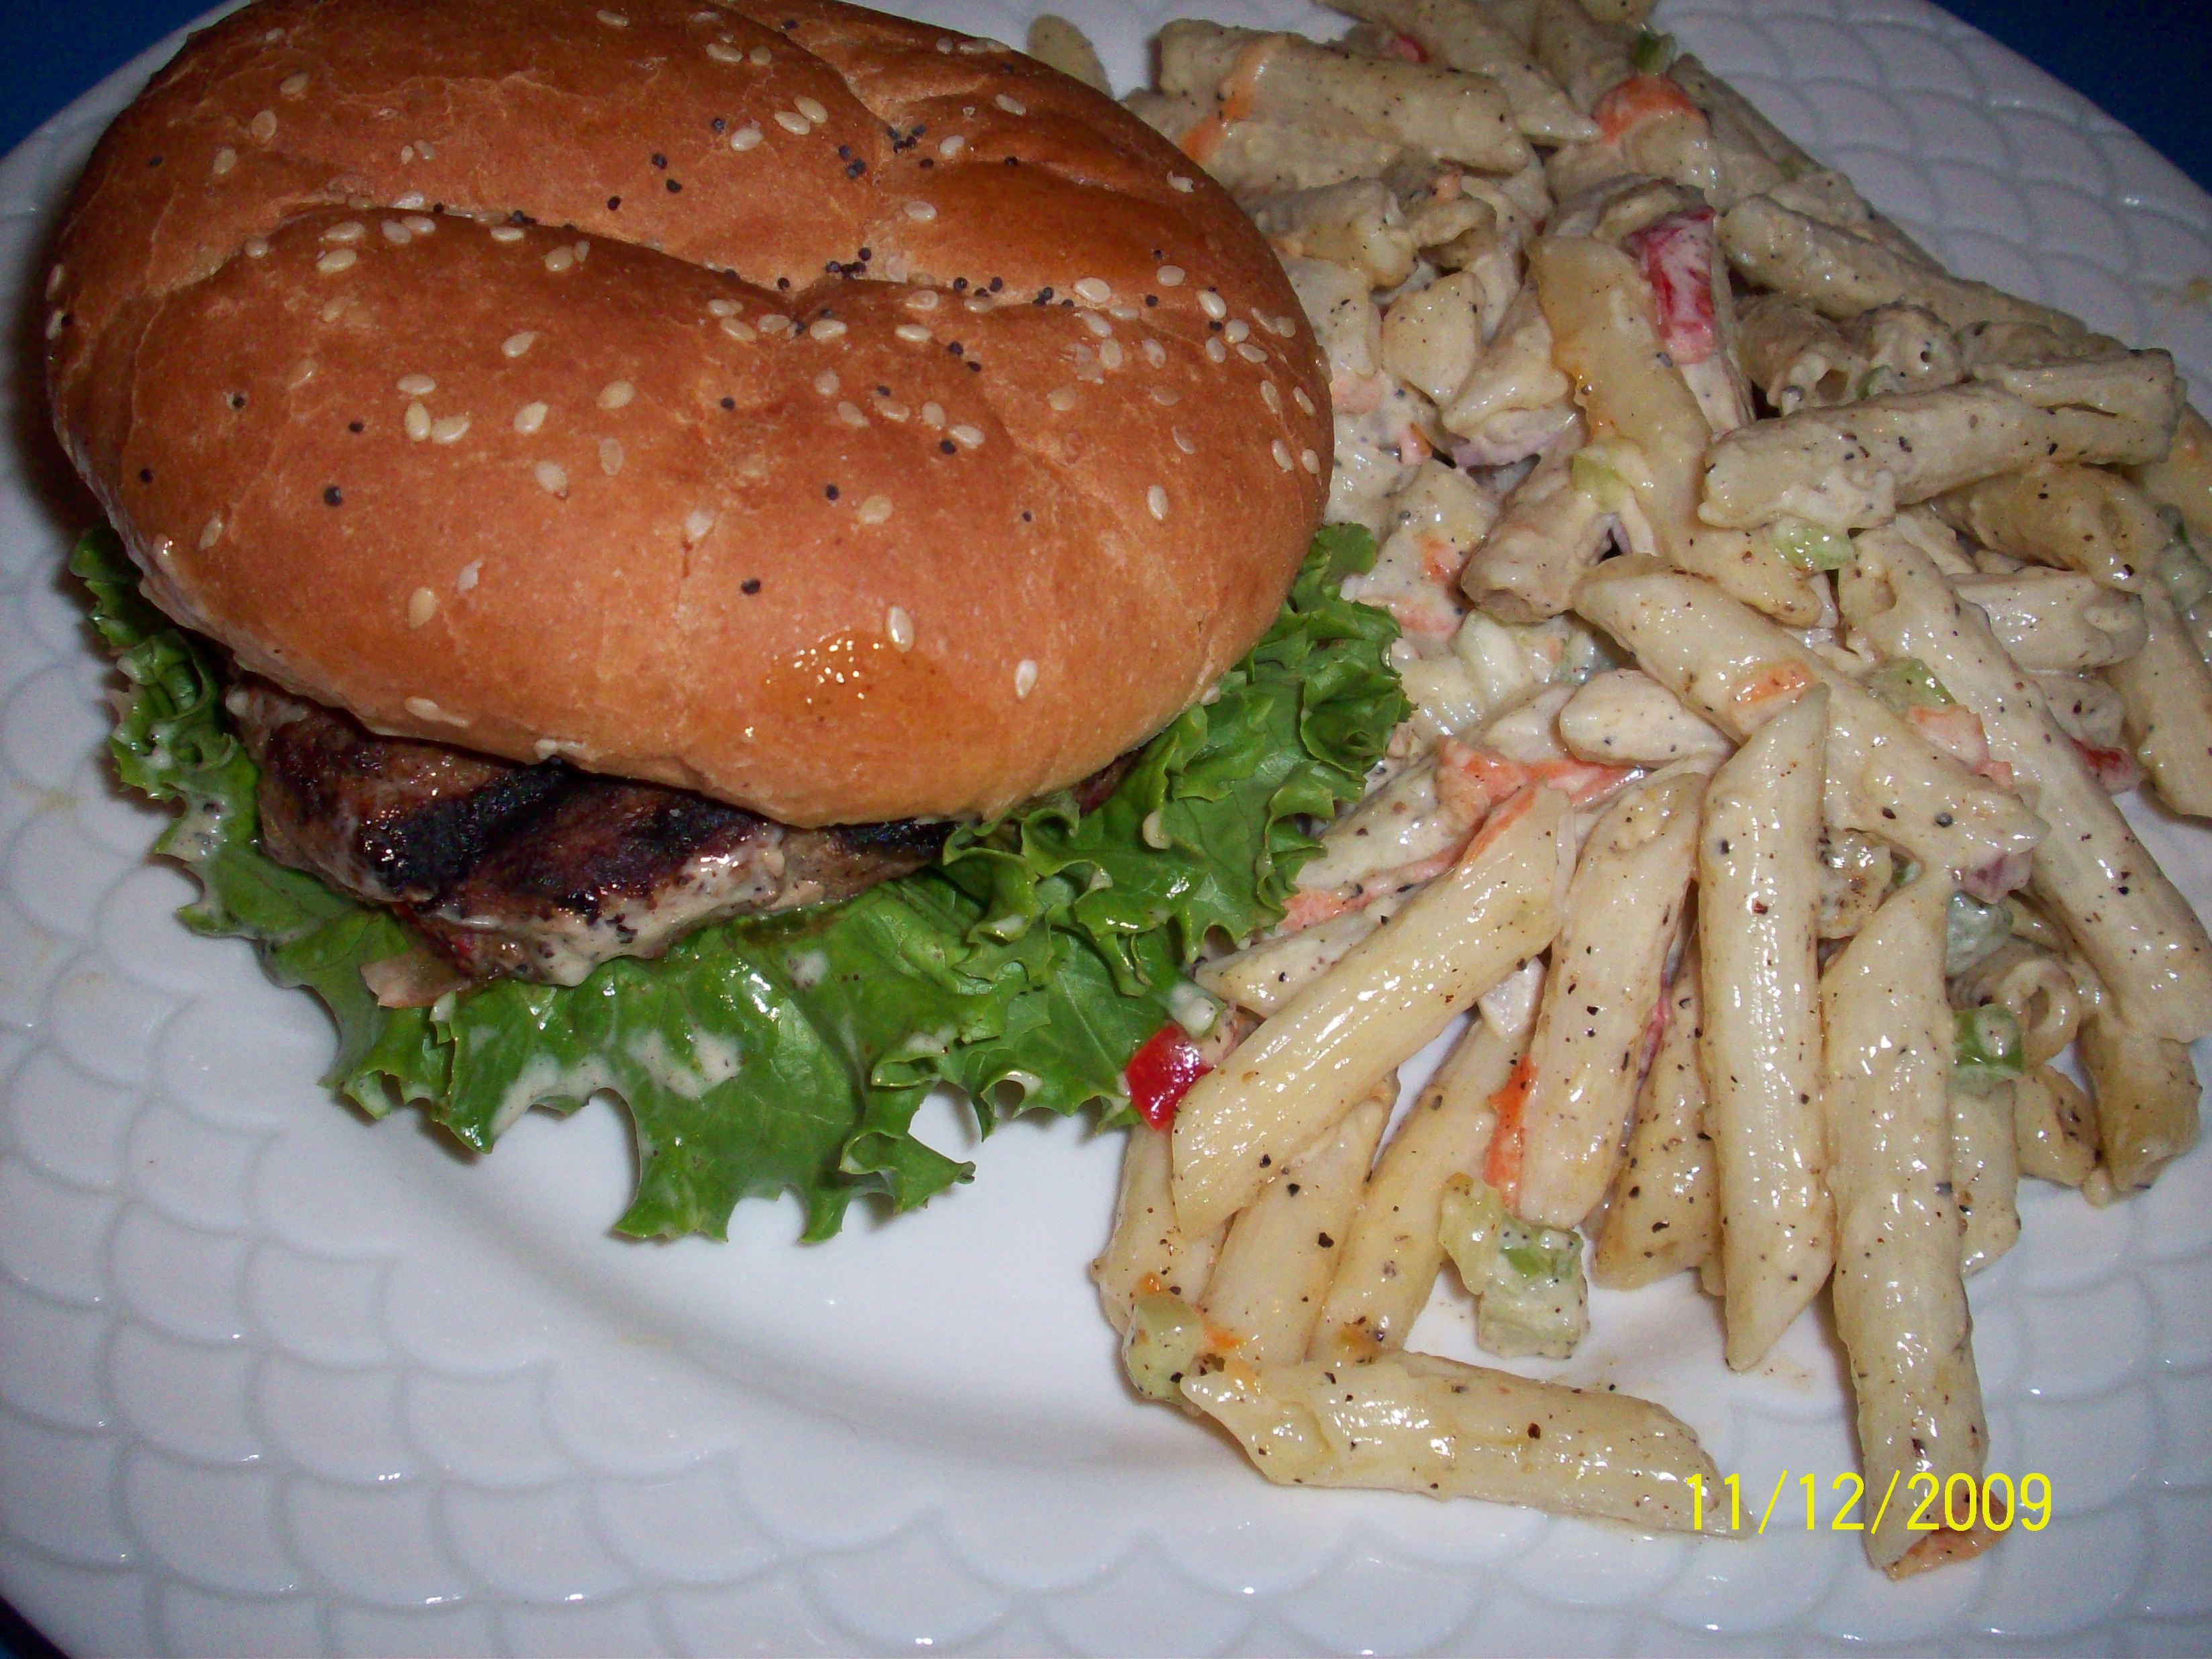 https://foodloader.net/cutie_2009-12-11_Turkey_Sandwich_with_Macaroni.jpg